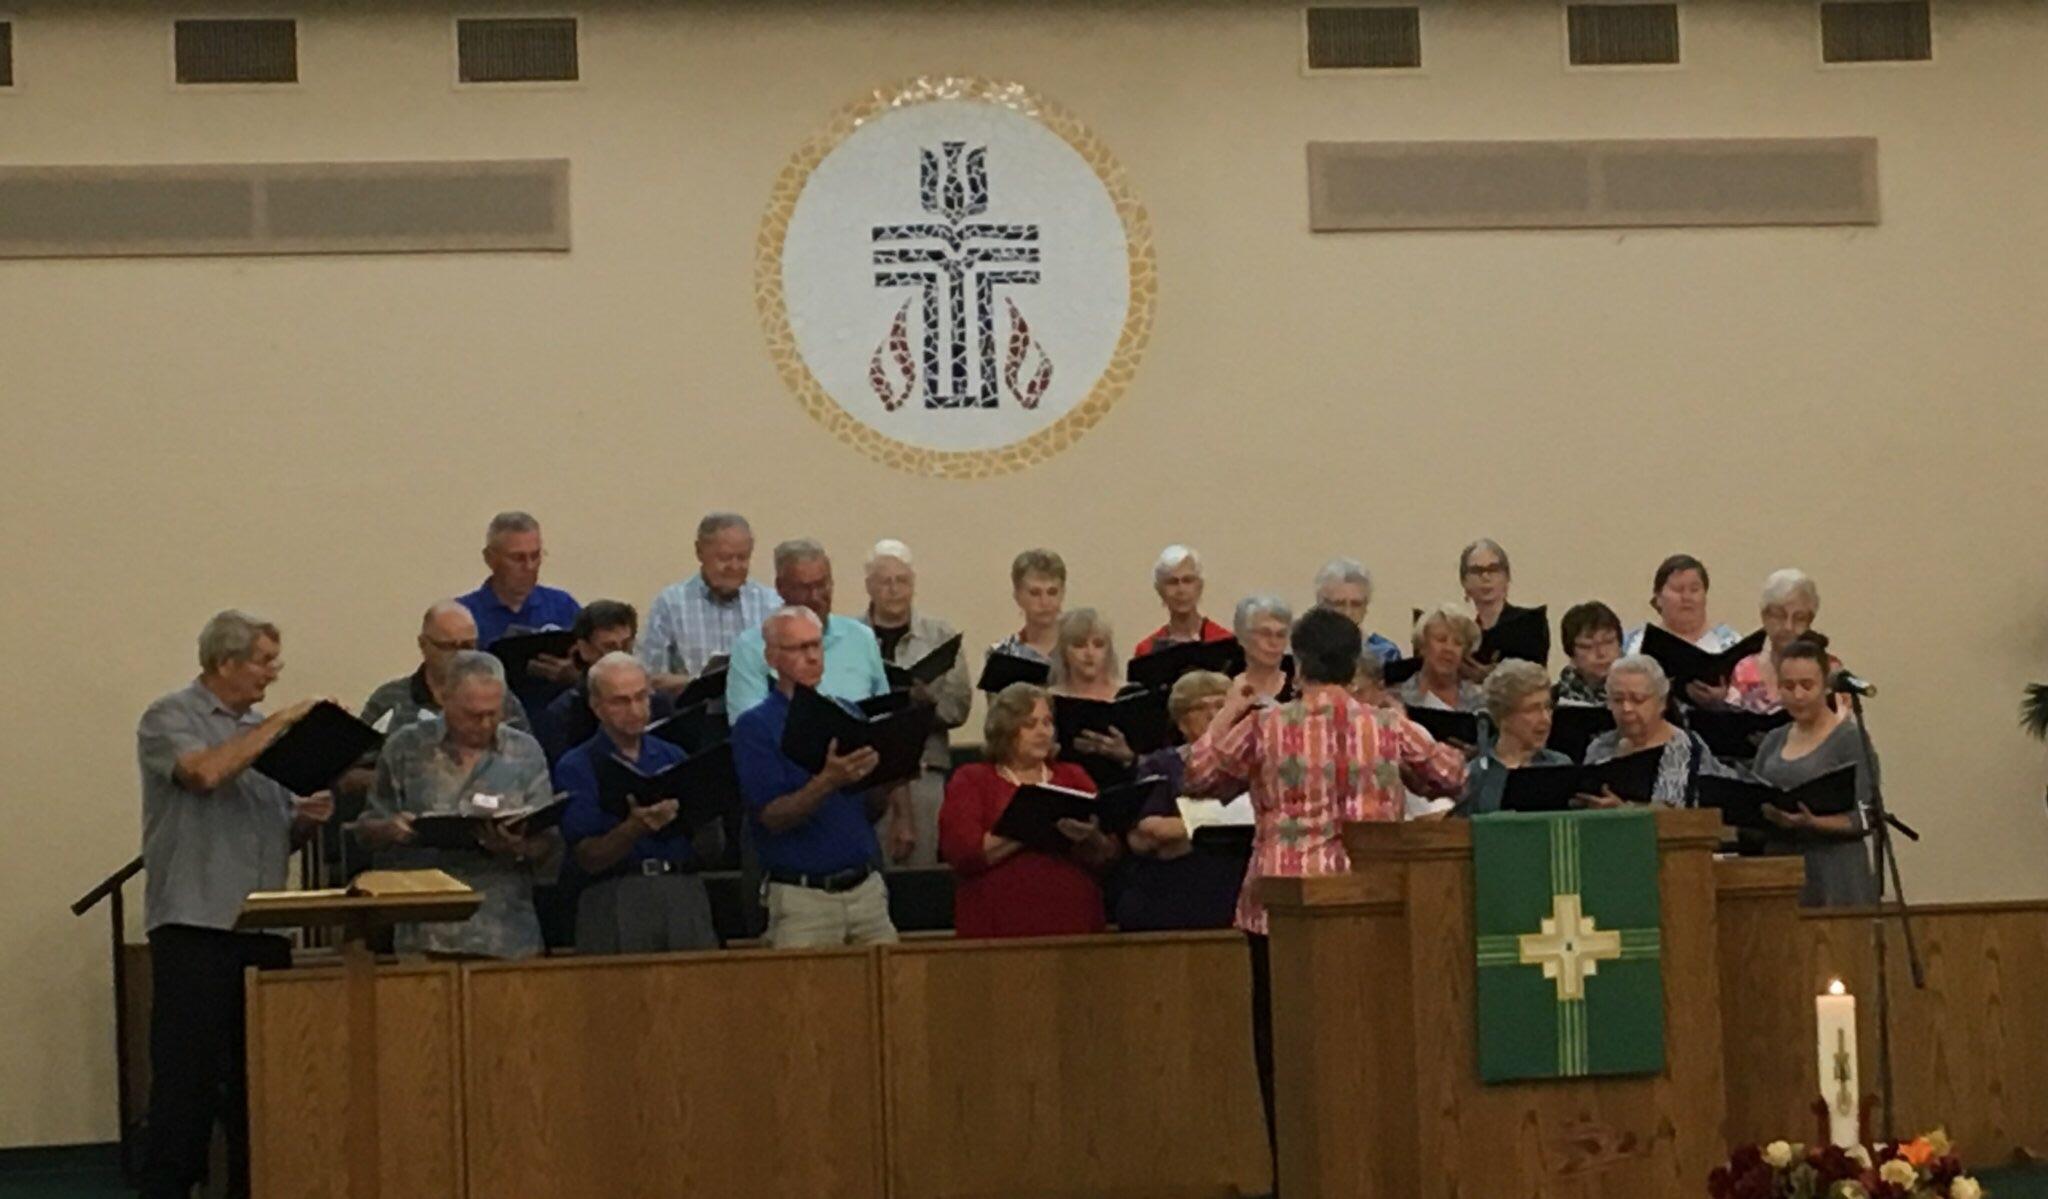 First Presbyterian Church - Connect - Music @ FPC